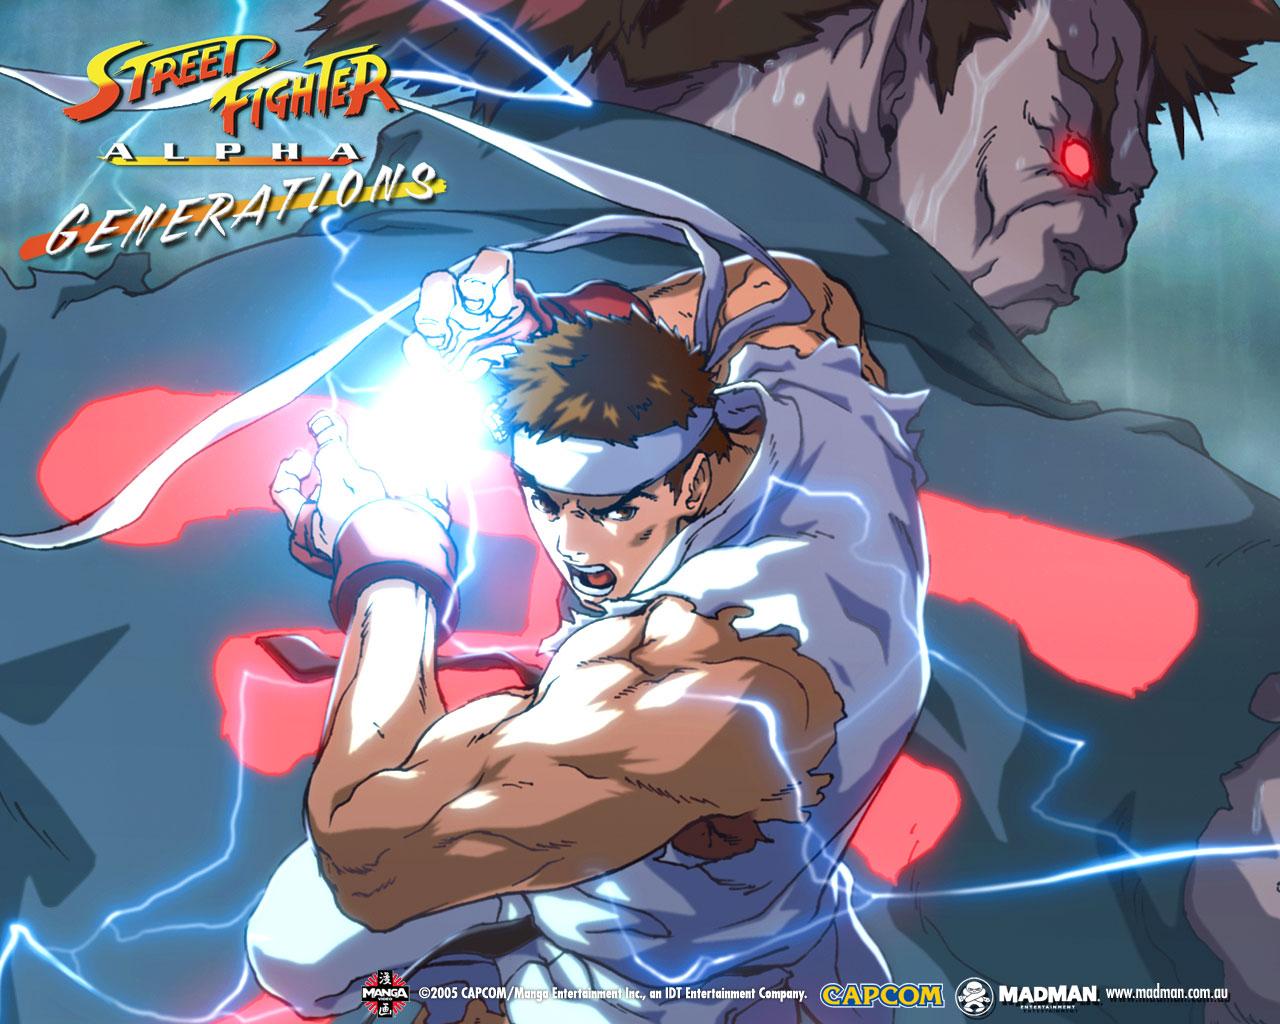 Street Fighter Alpha Generations Madman Entertainment